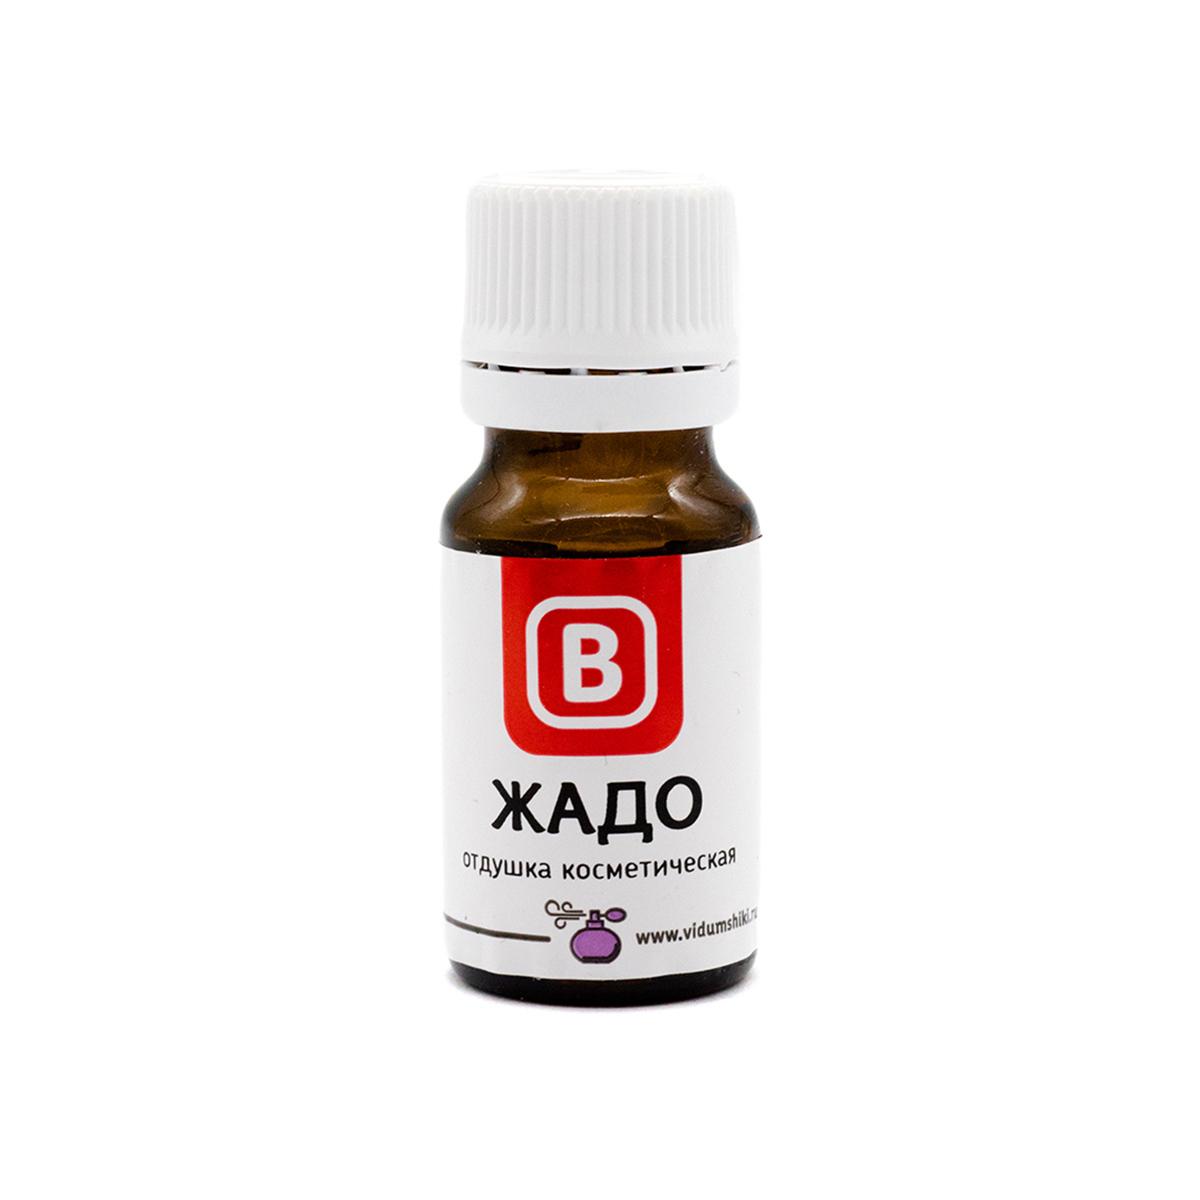 Отдушка косметическая (парфюм.) 10мл